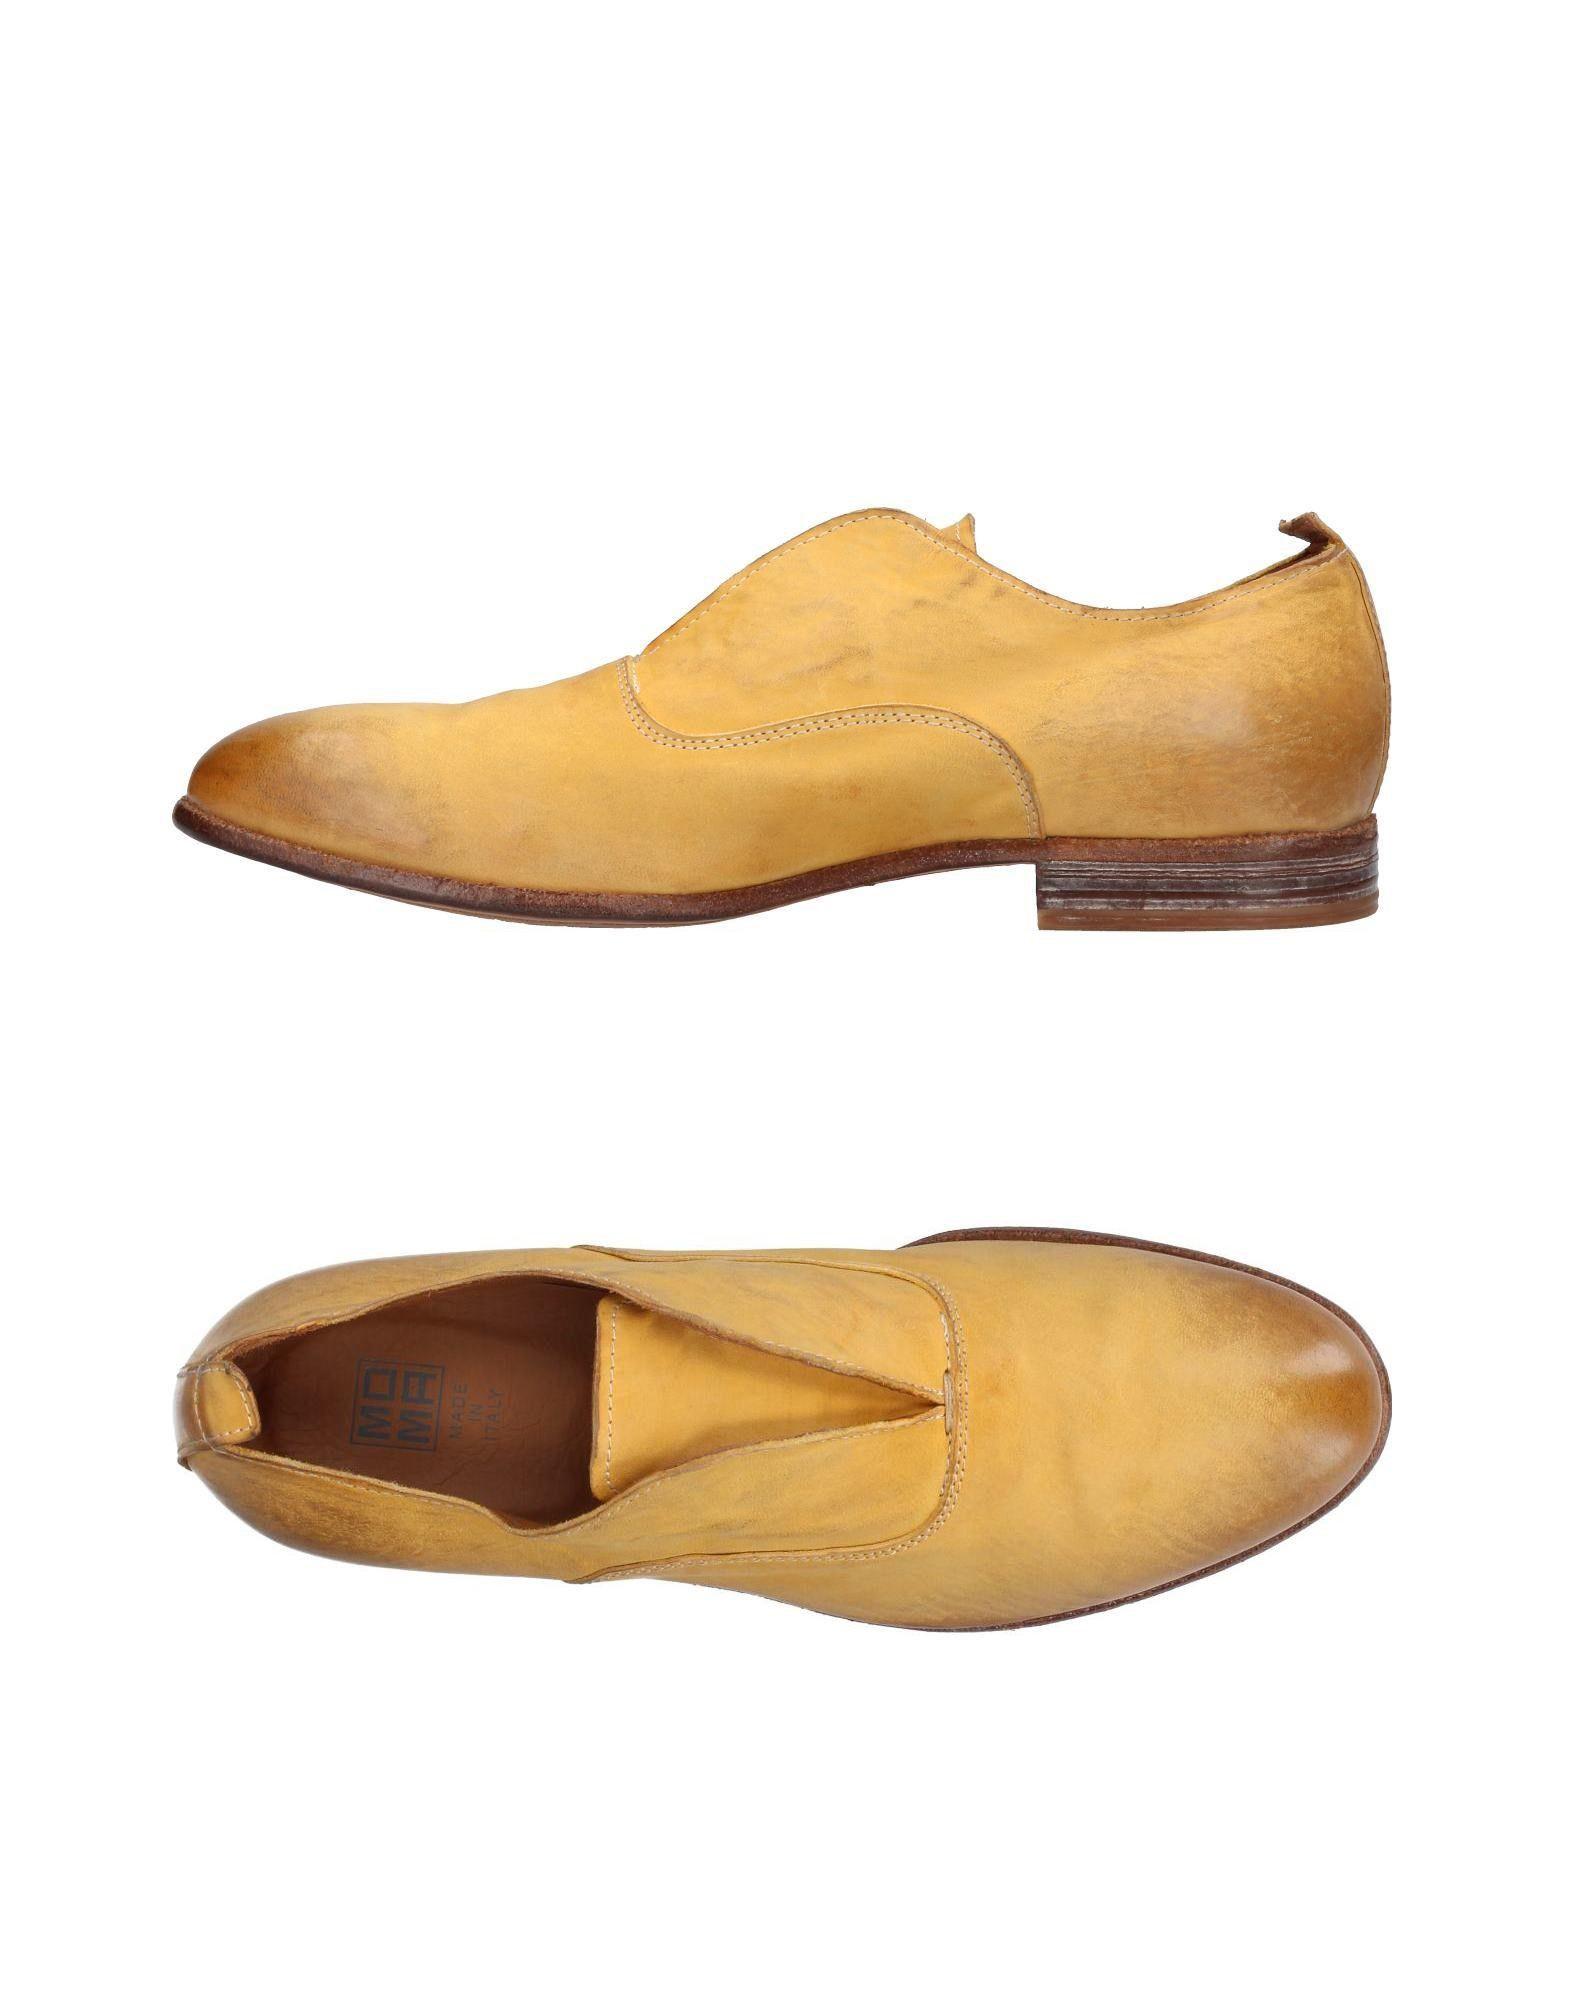 Moma Mokassins Herren  11411999JX Gute Qualität beliebte Schuhe